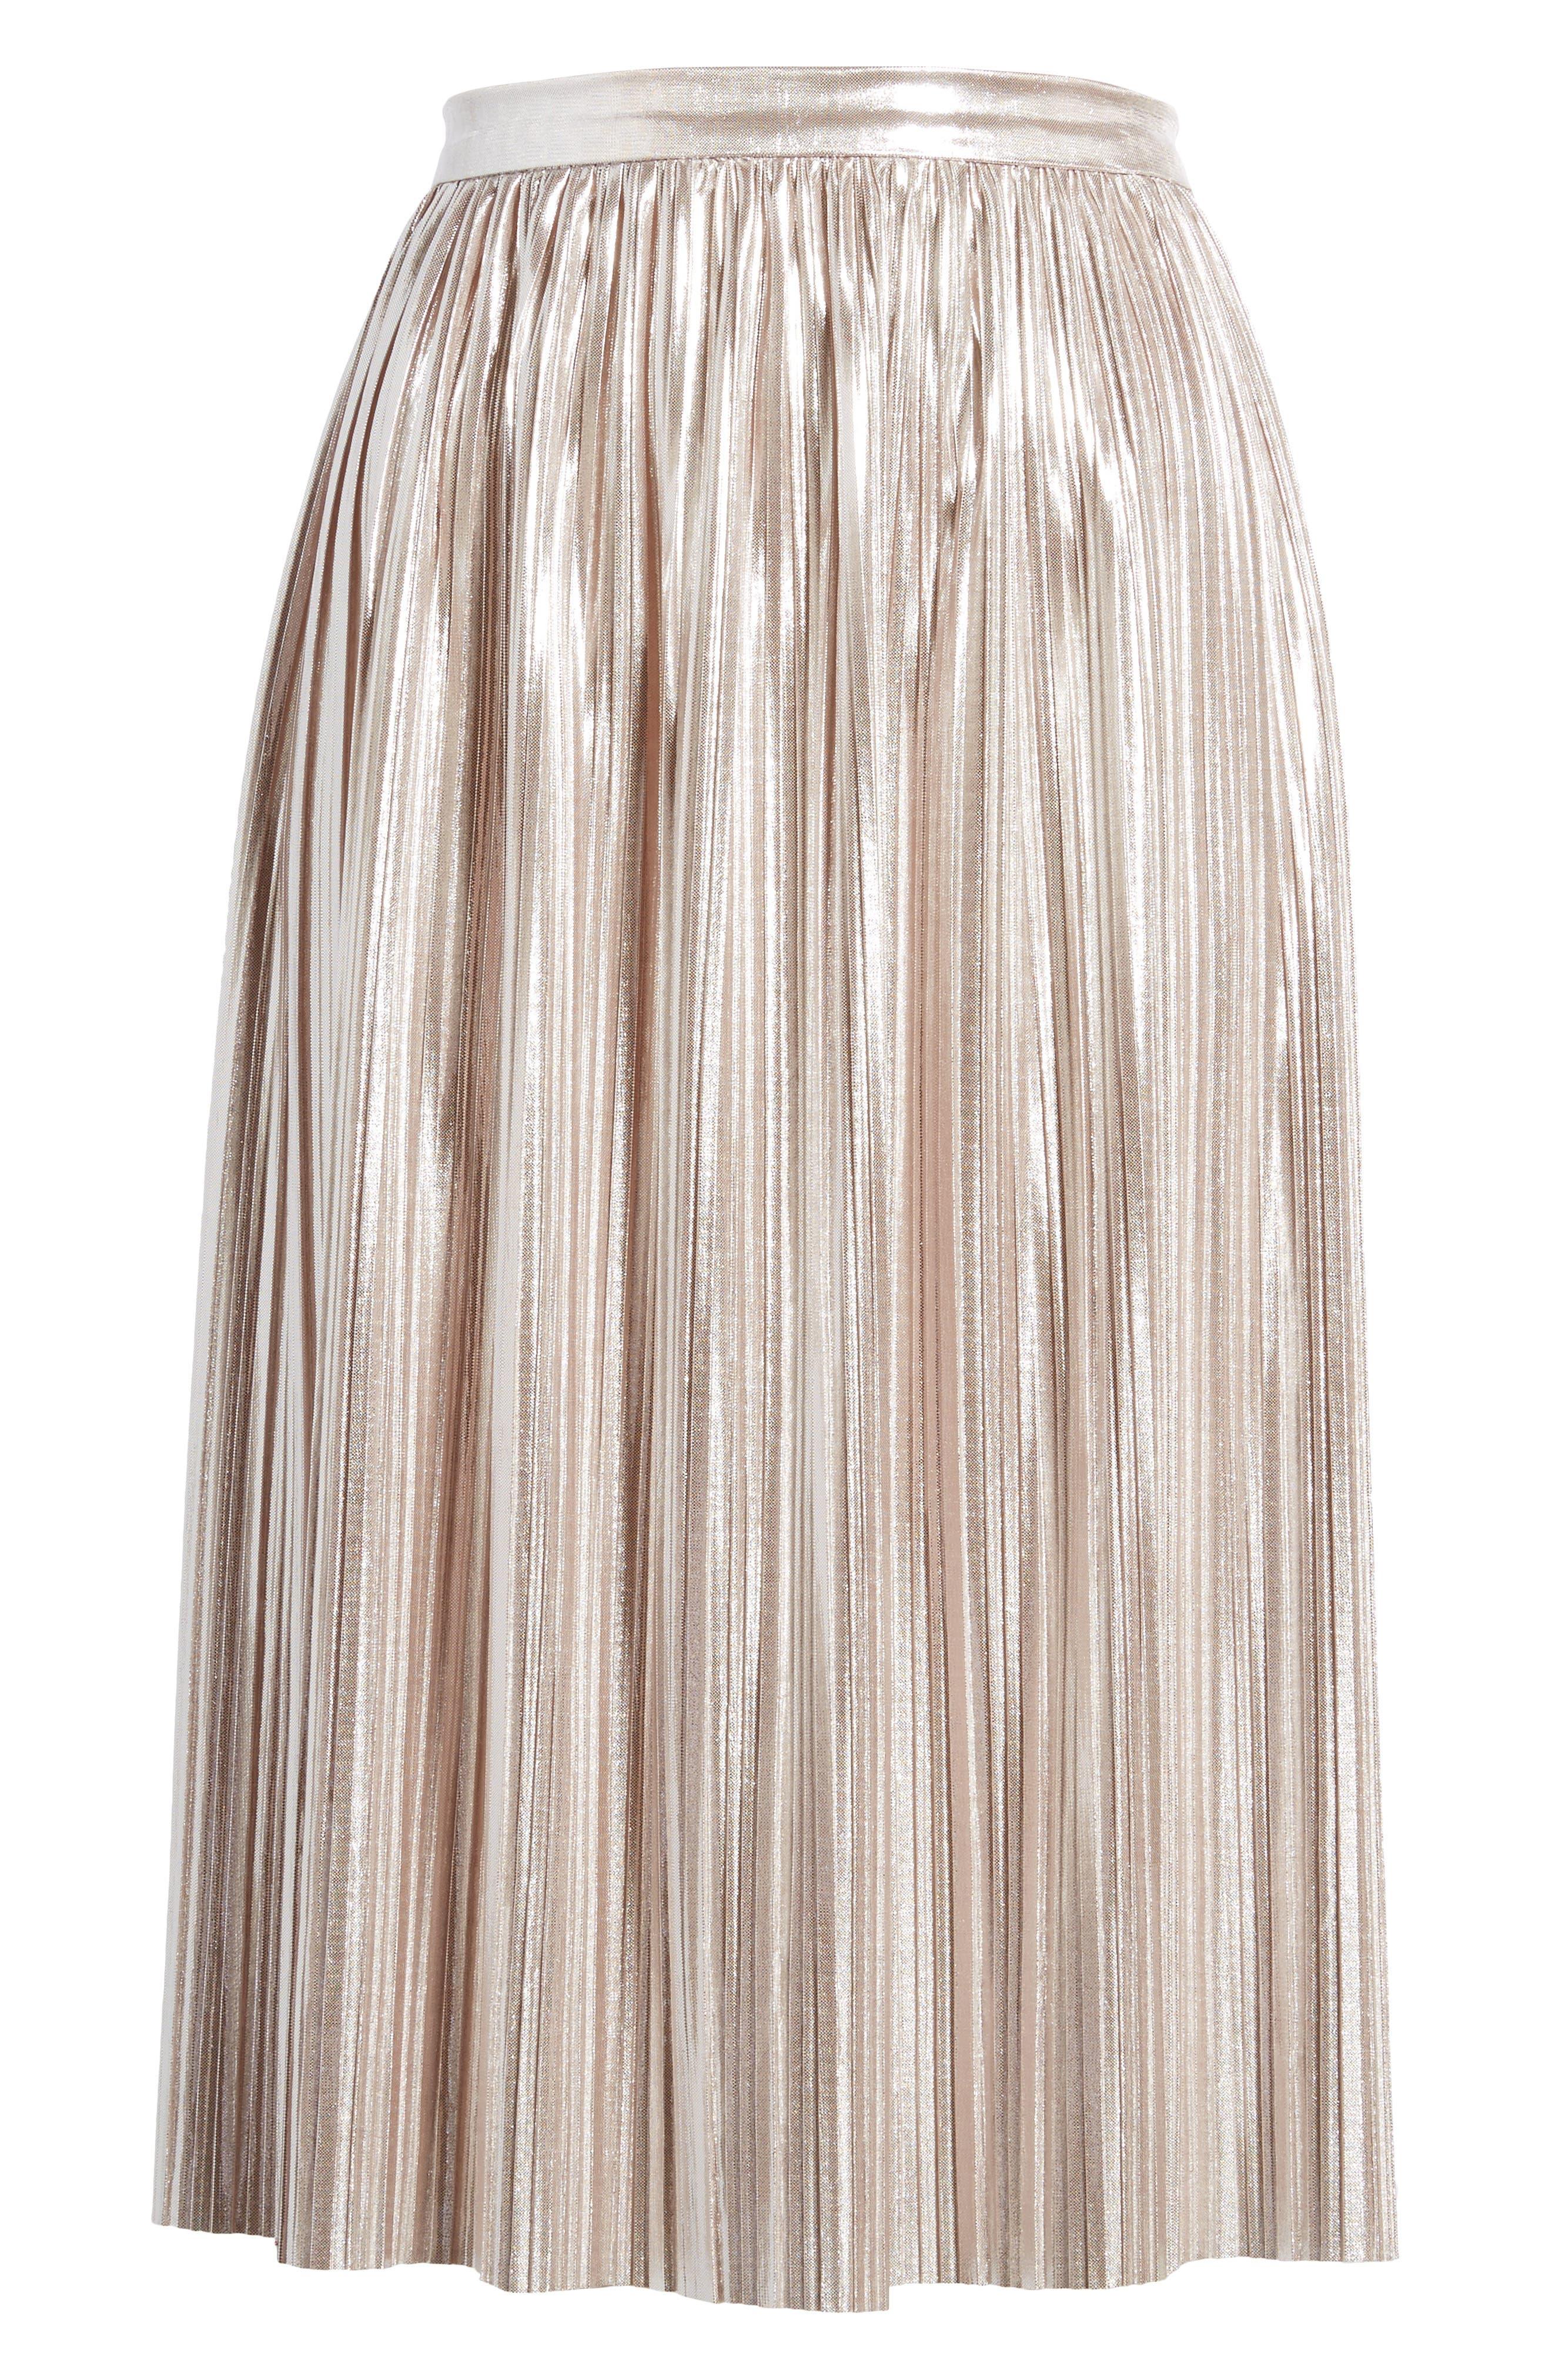 Sateen Ruffle Skirt,                             Alternate thumbnail 6, color,